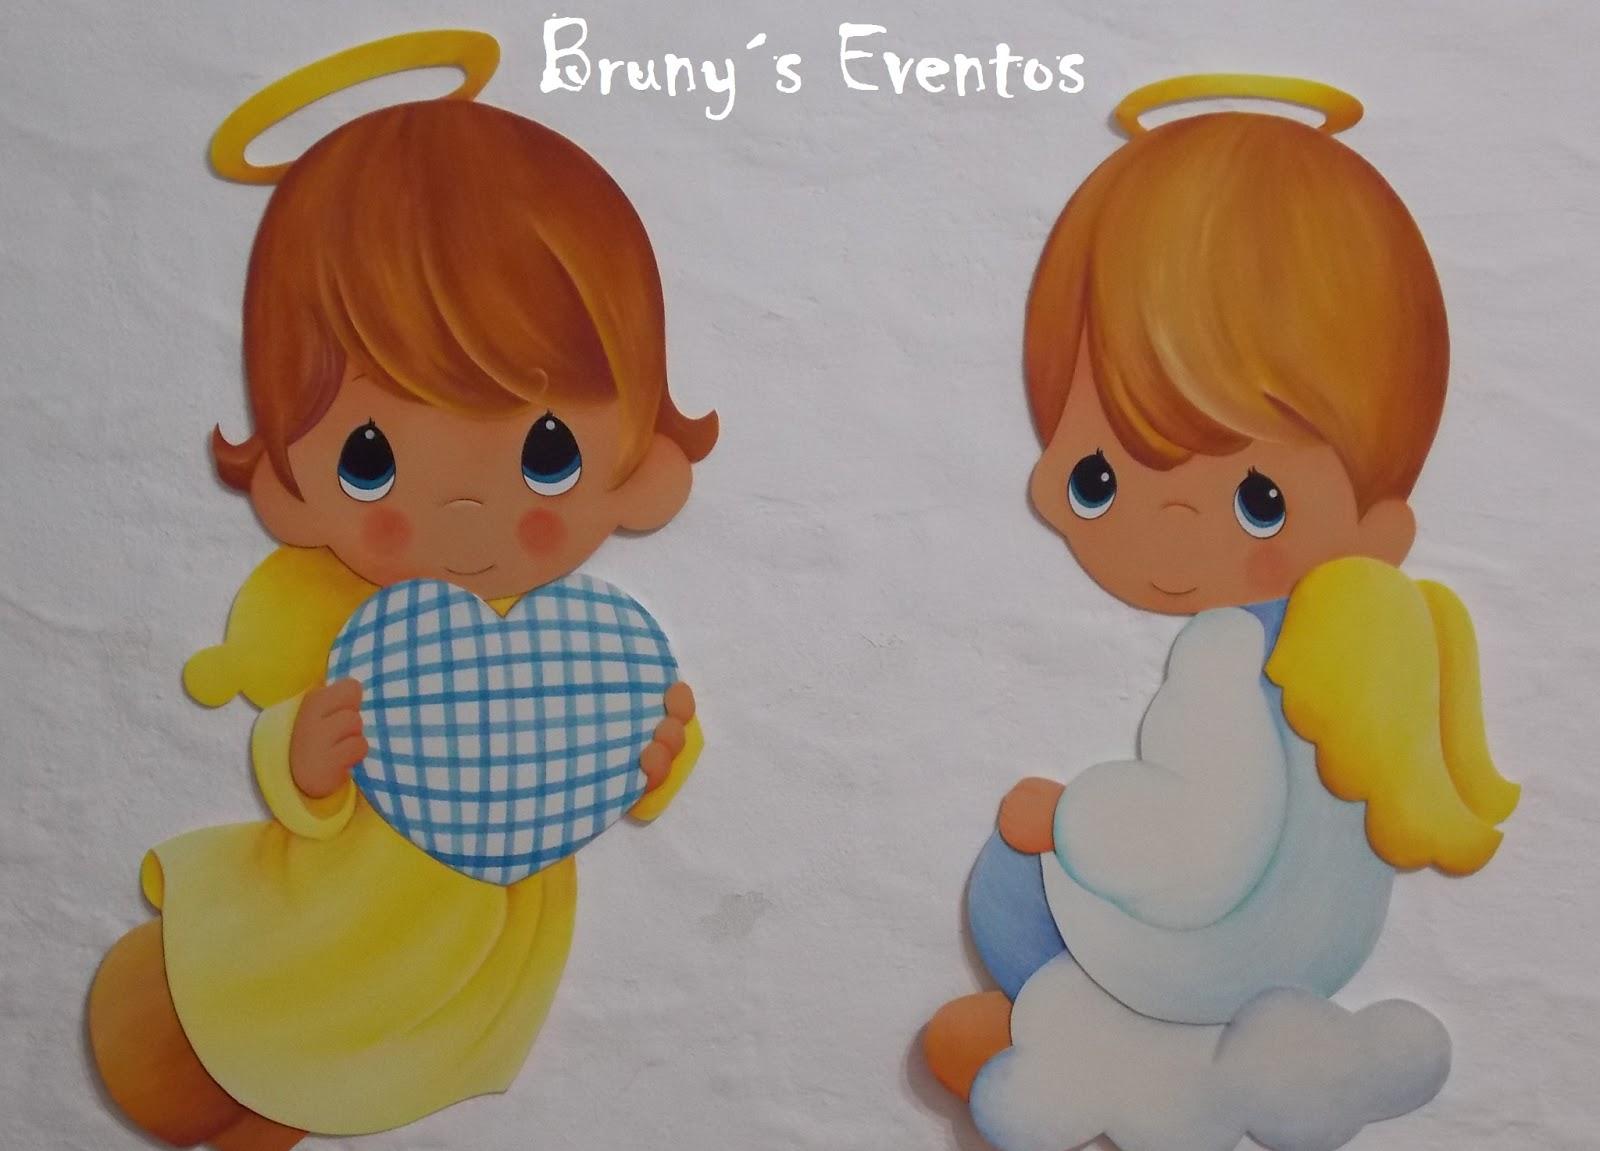 Brunys eventos figuras en goma eva comunion - Dibujos en goma eva ...